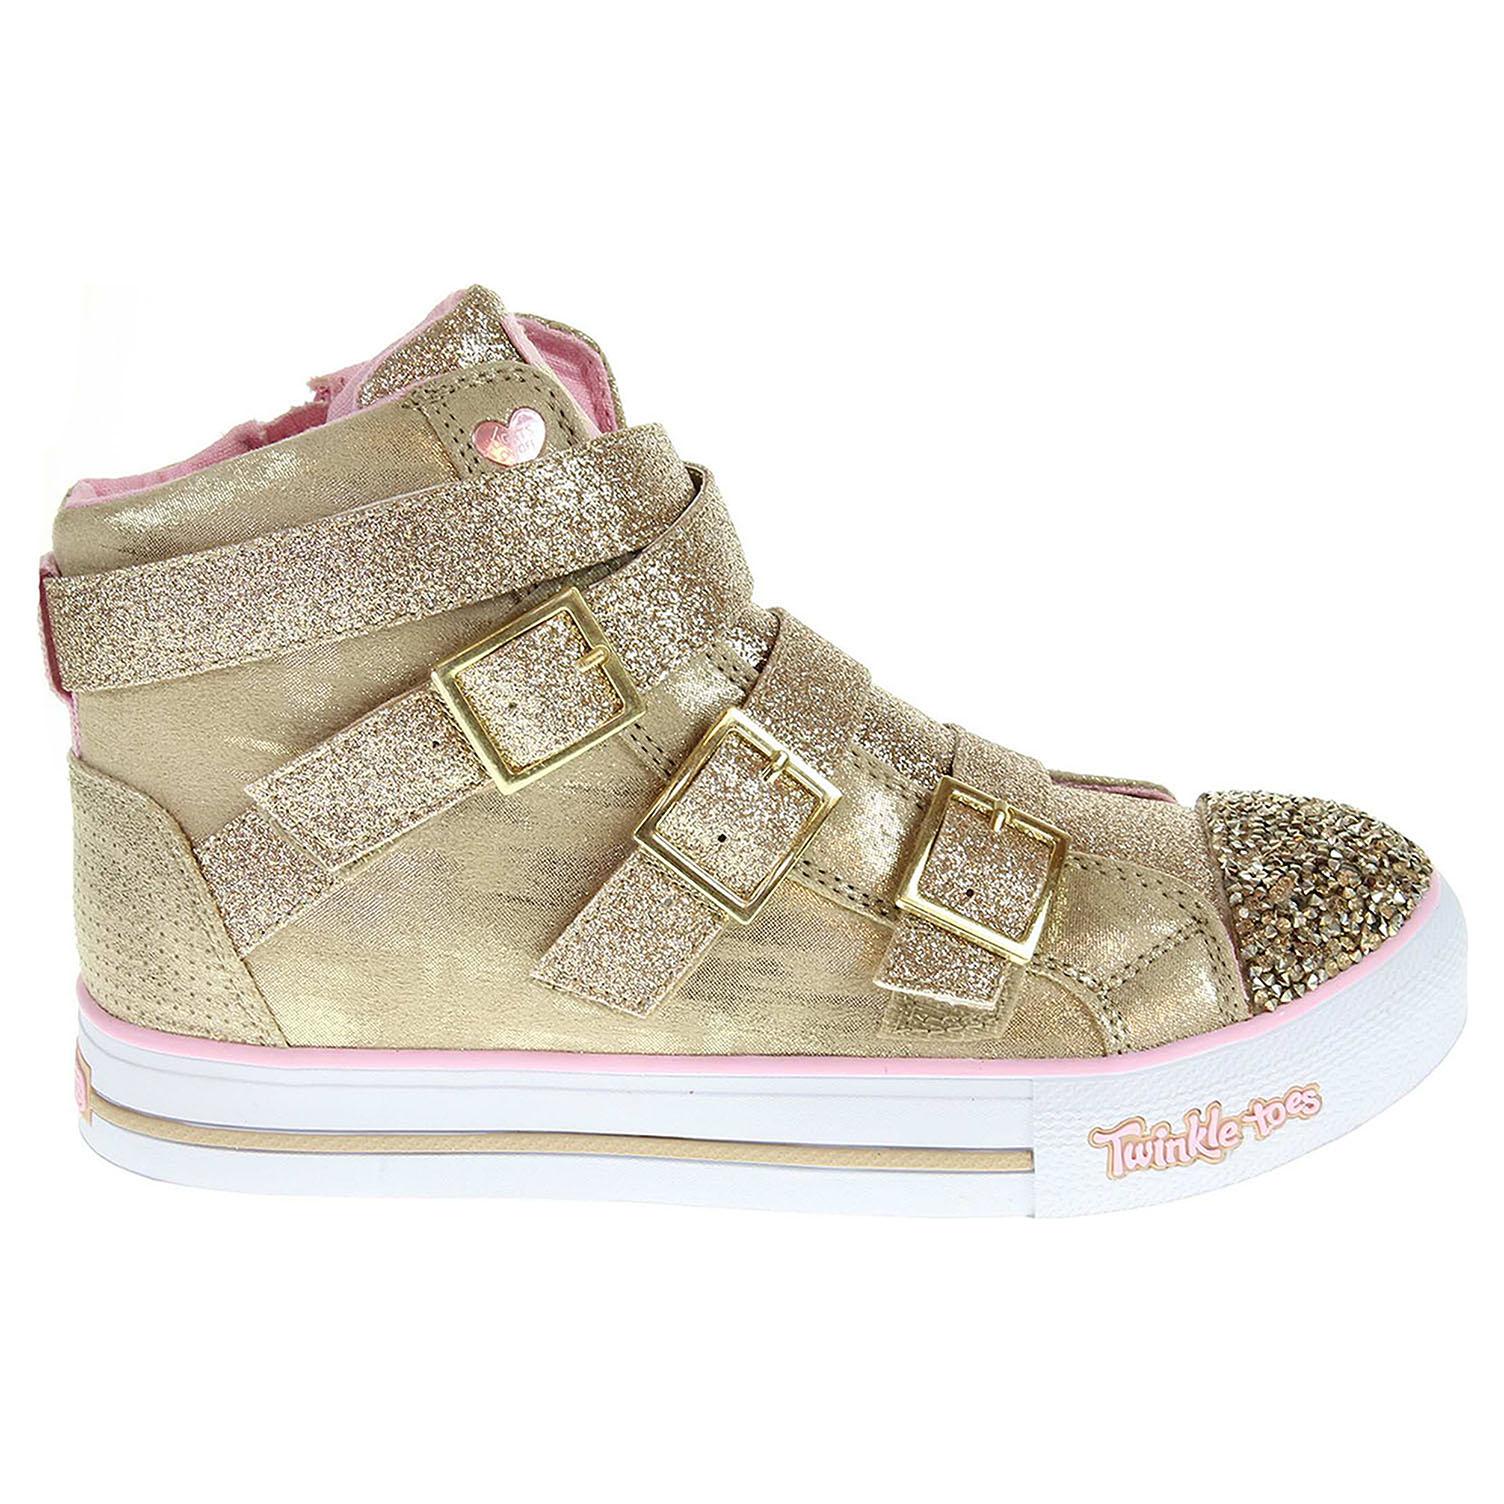 Ecco Skechers Crisscross Craze gold-pink 26200100